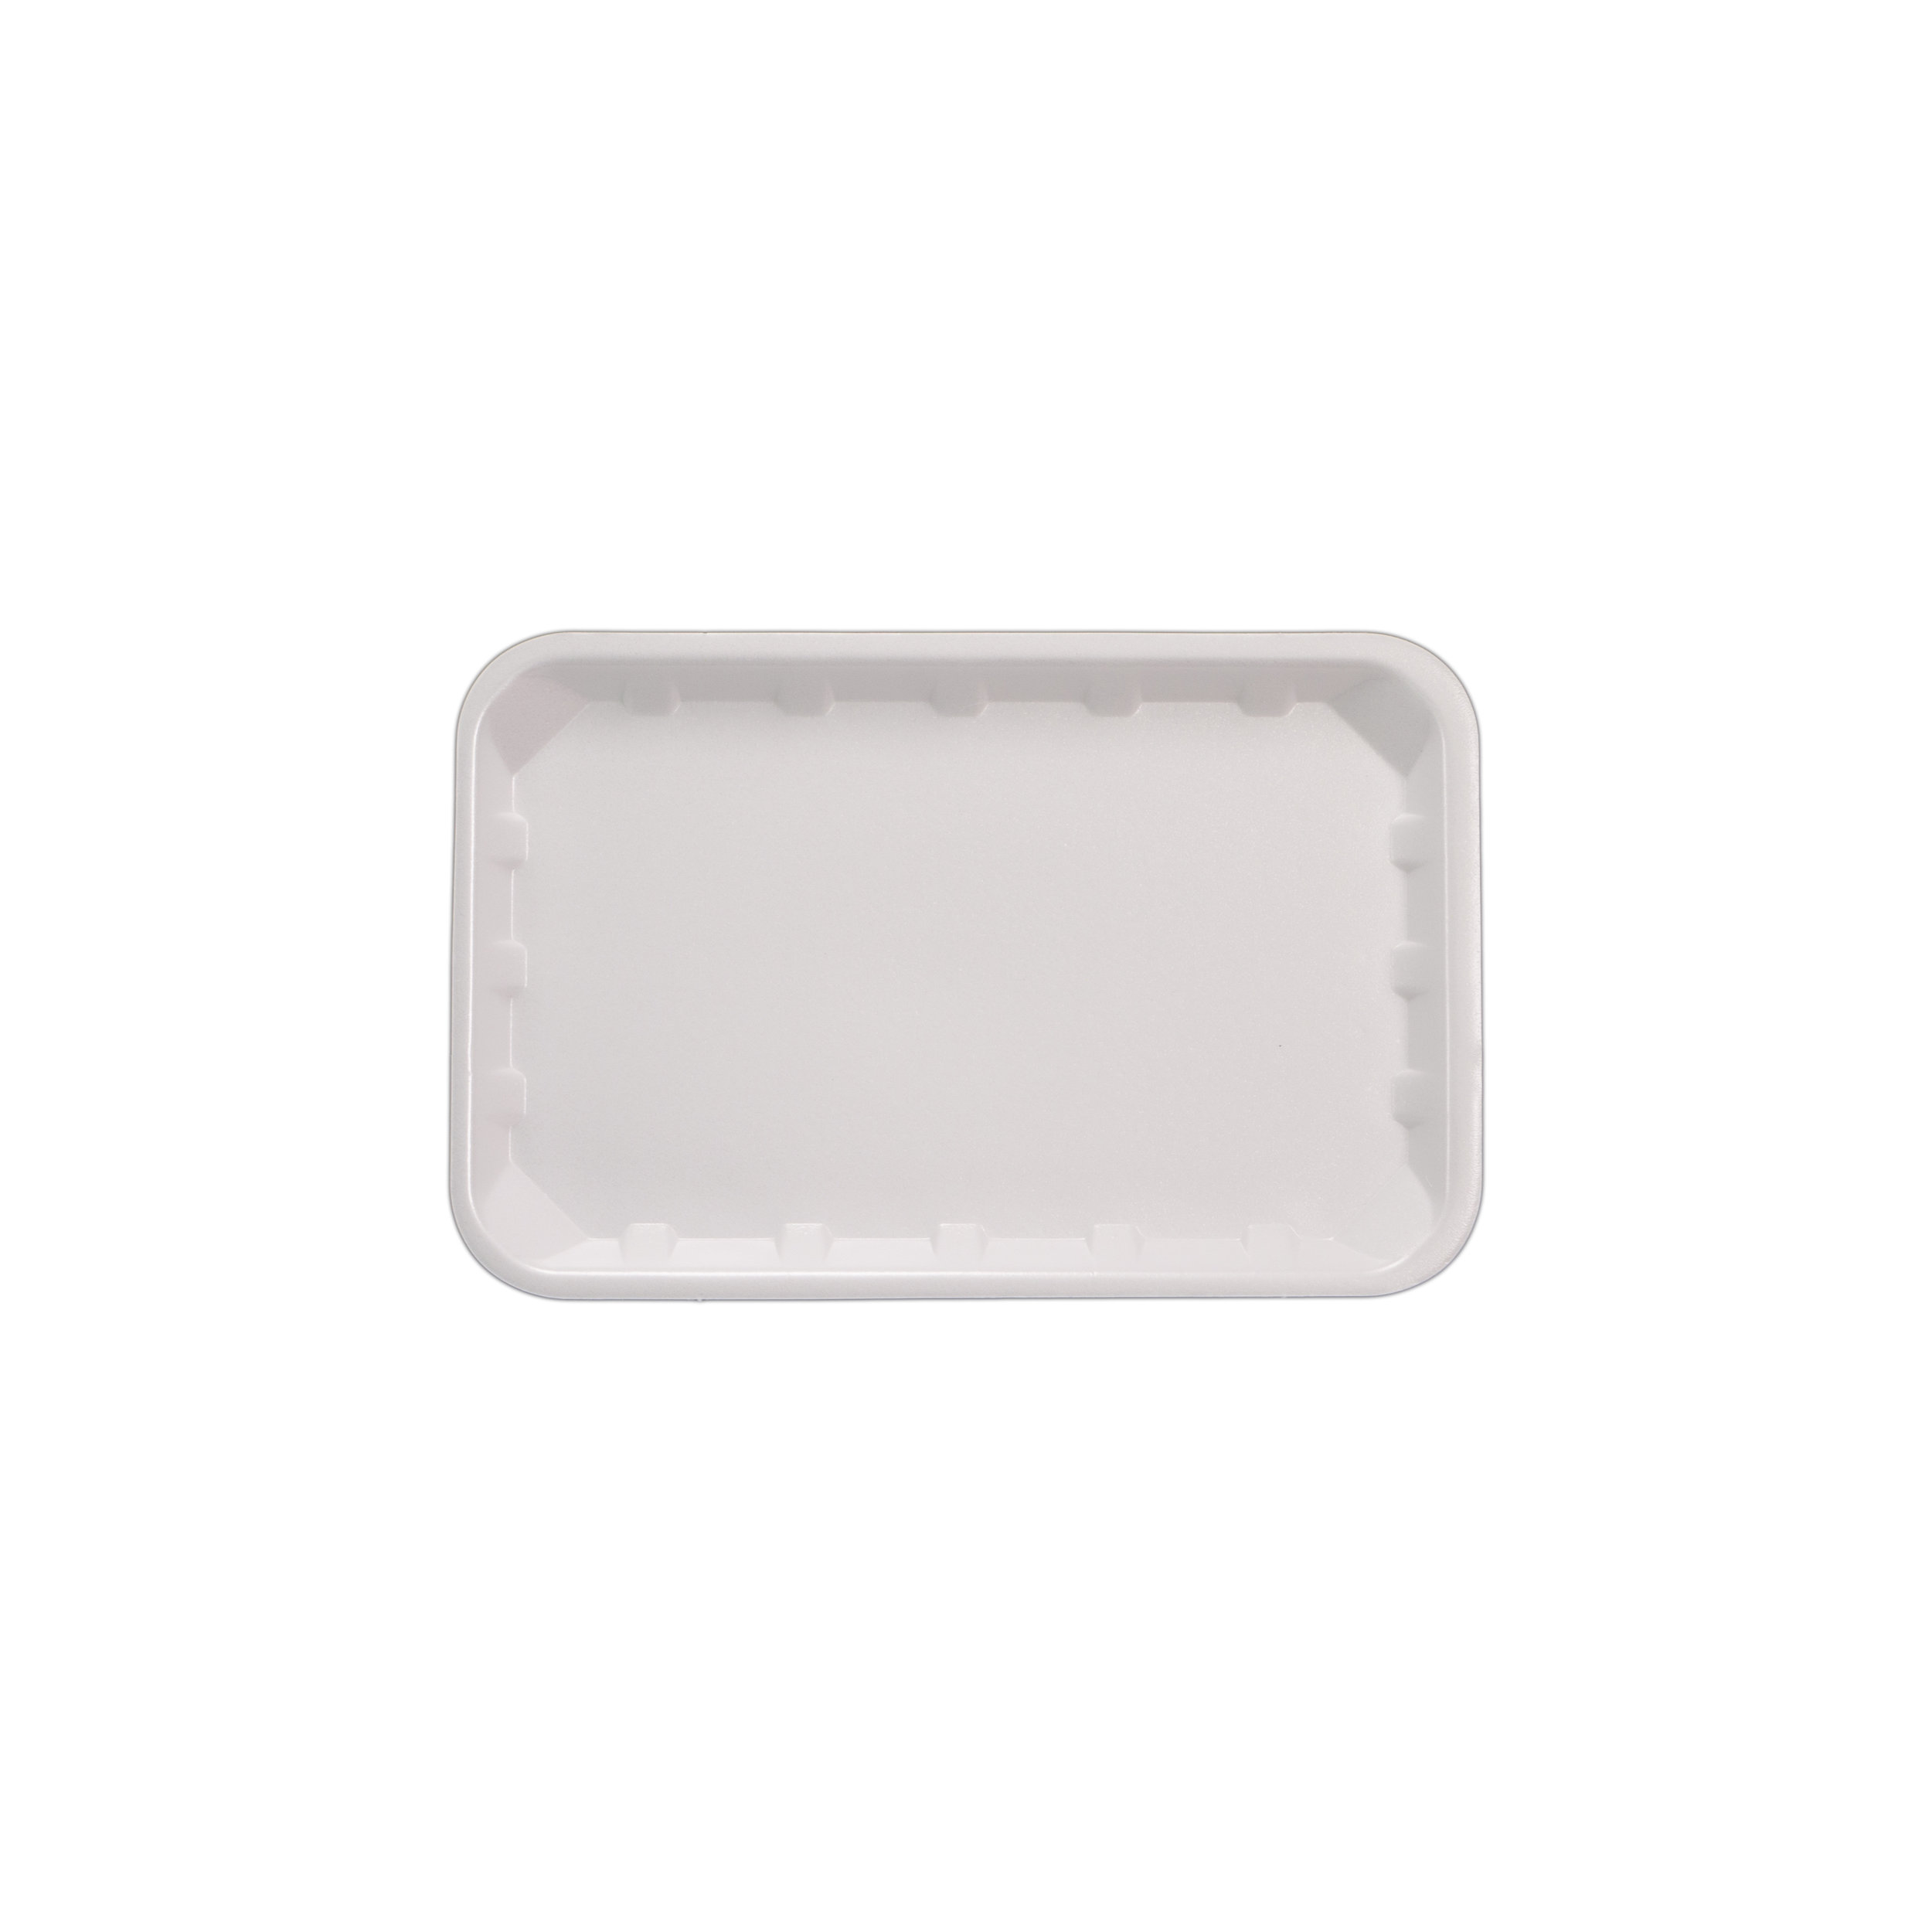 iK0311      CLOSED CELL SHALLOW 8x5    125 per sleeve 1000 per carton